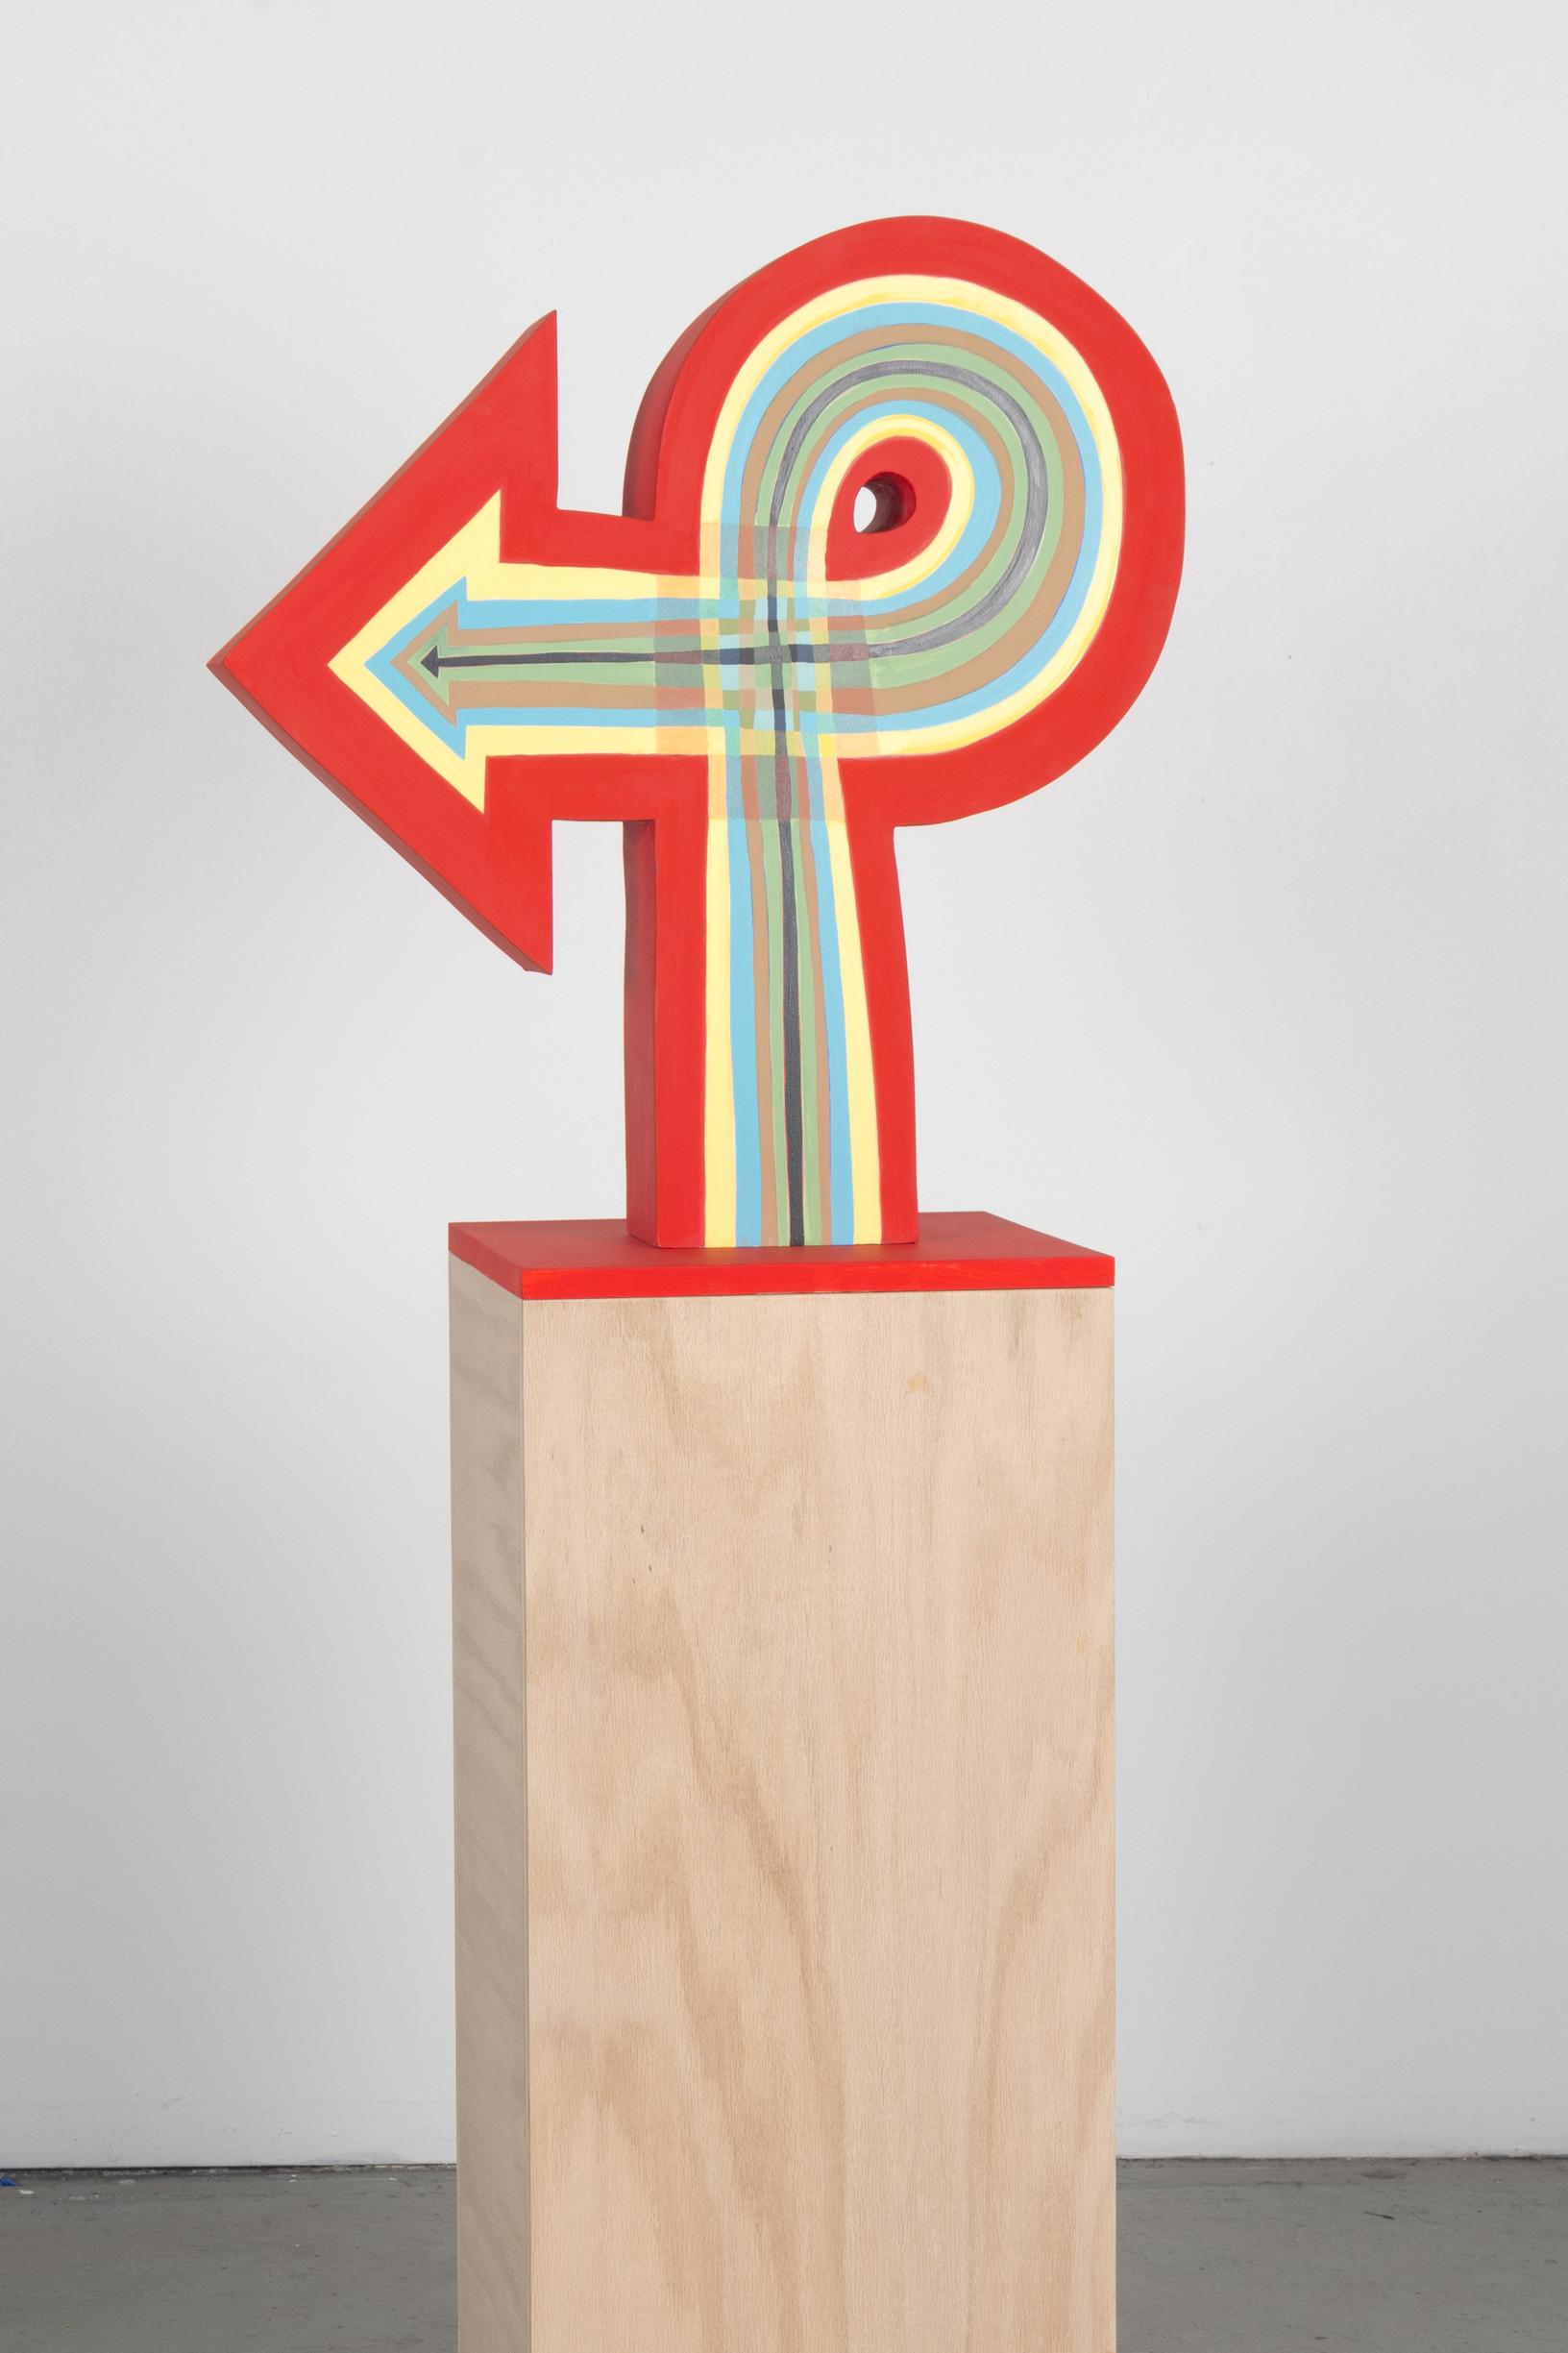 - Blended Arrow2013Gouache on solid poplar23 x 23 x 5 inches